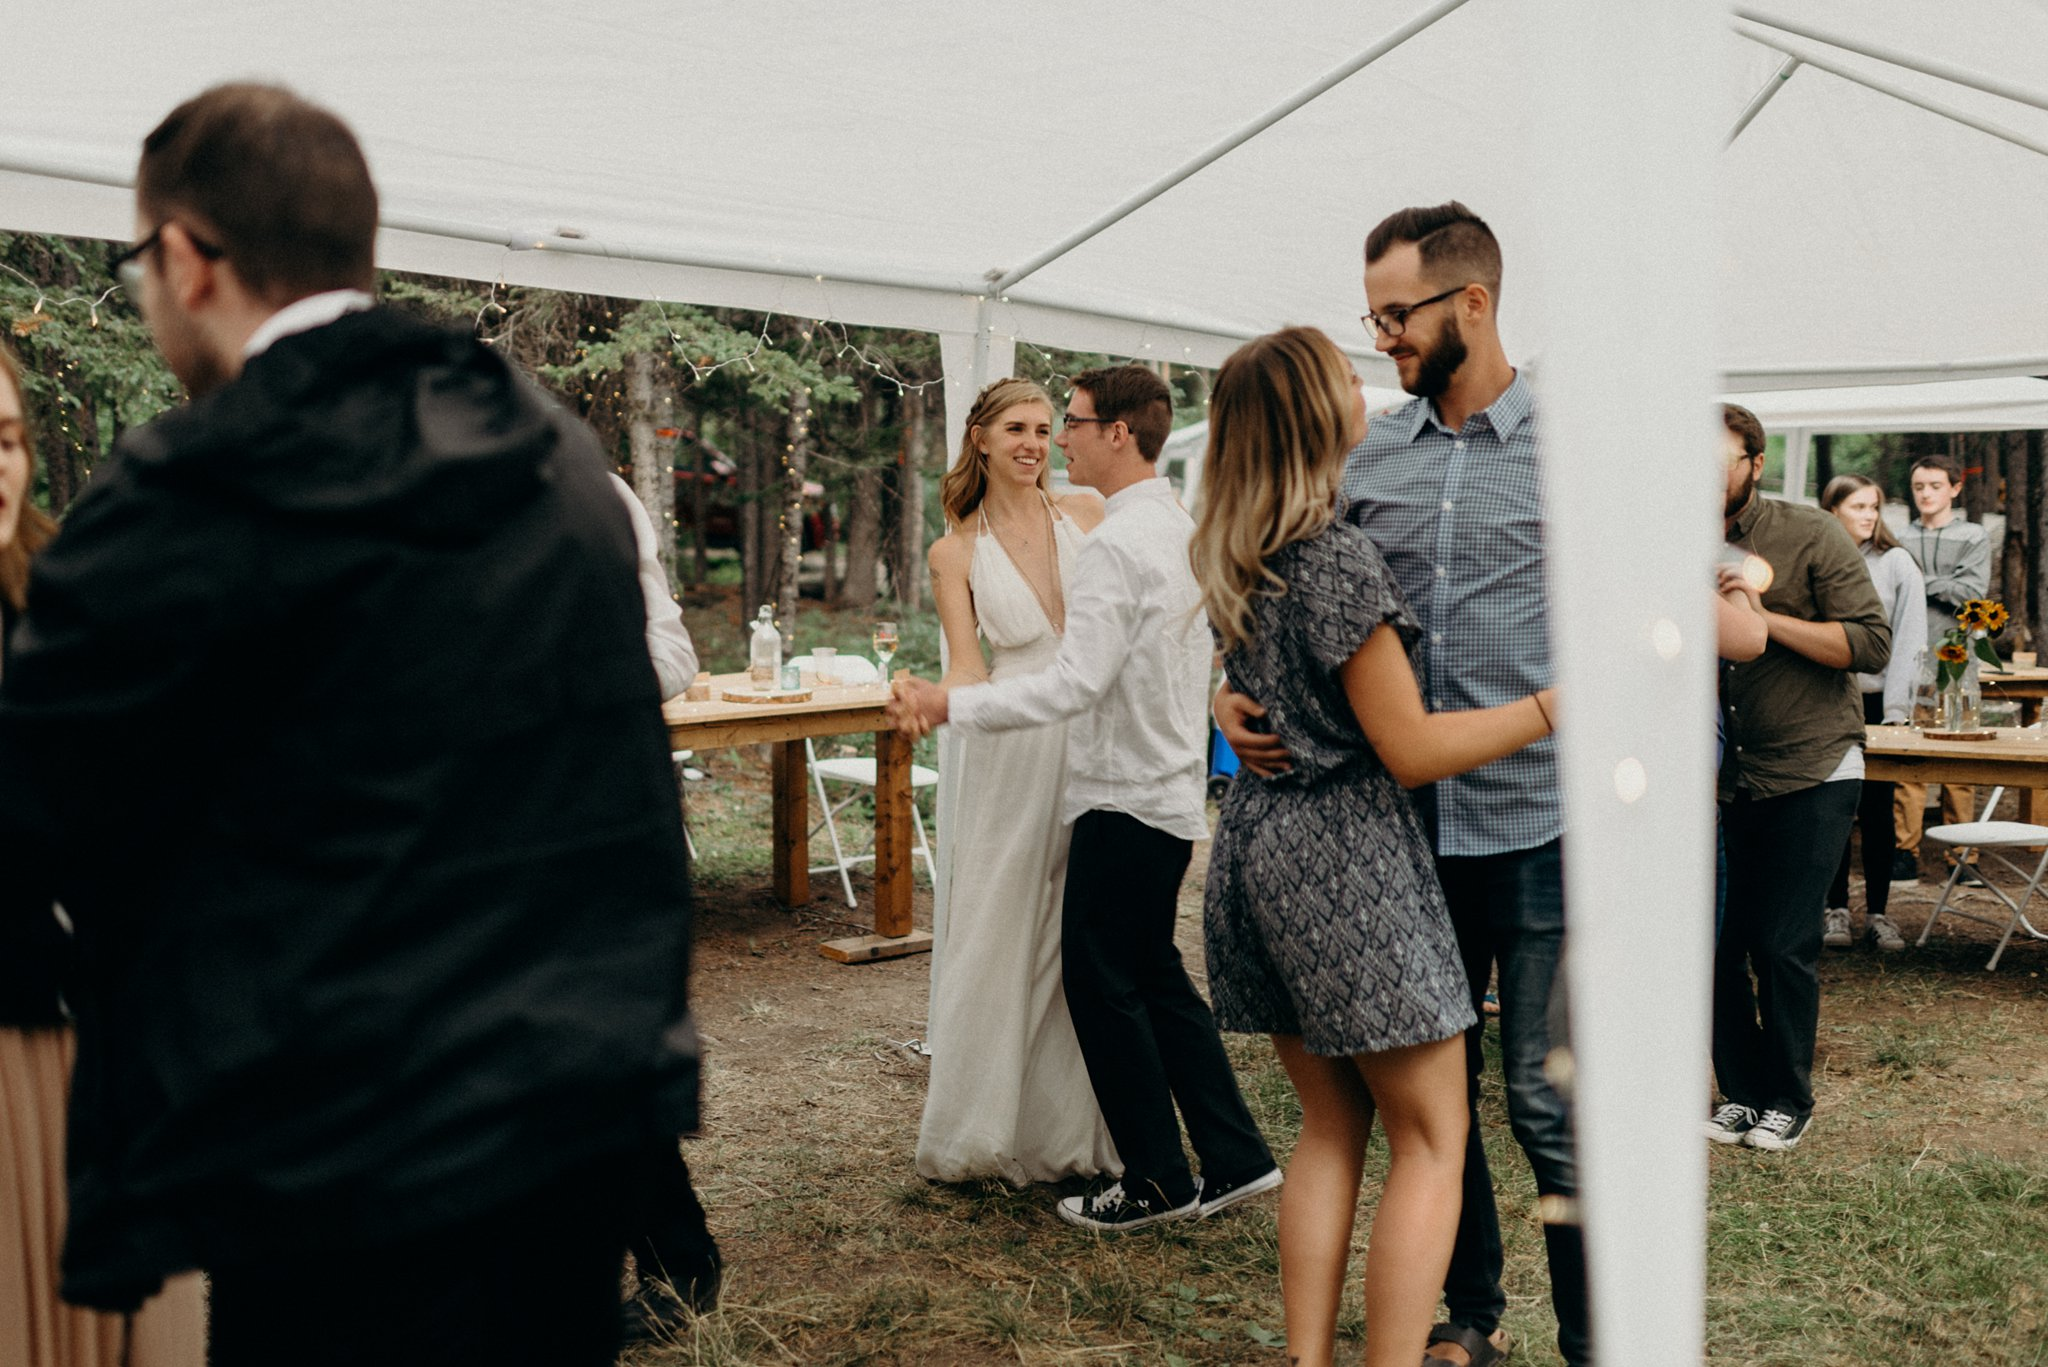 kaihla_tonai_intimate_wedding_elopement_photographer_6436.jpg